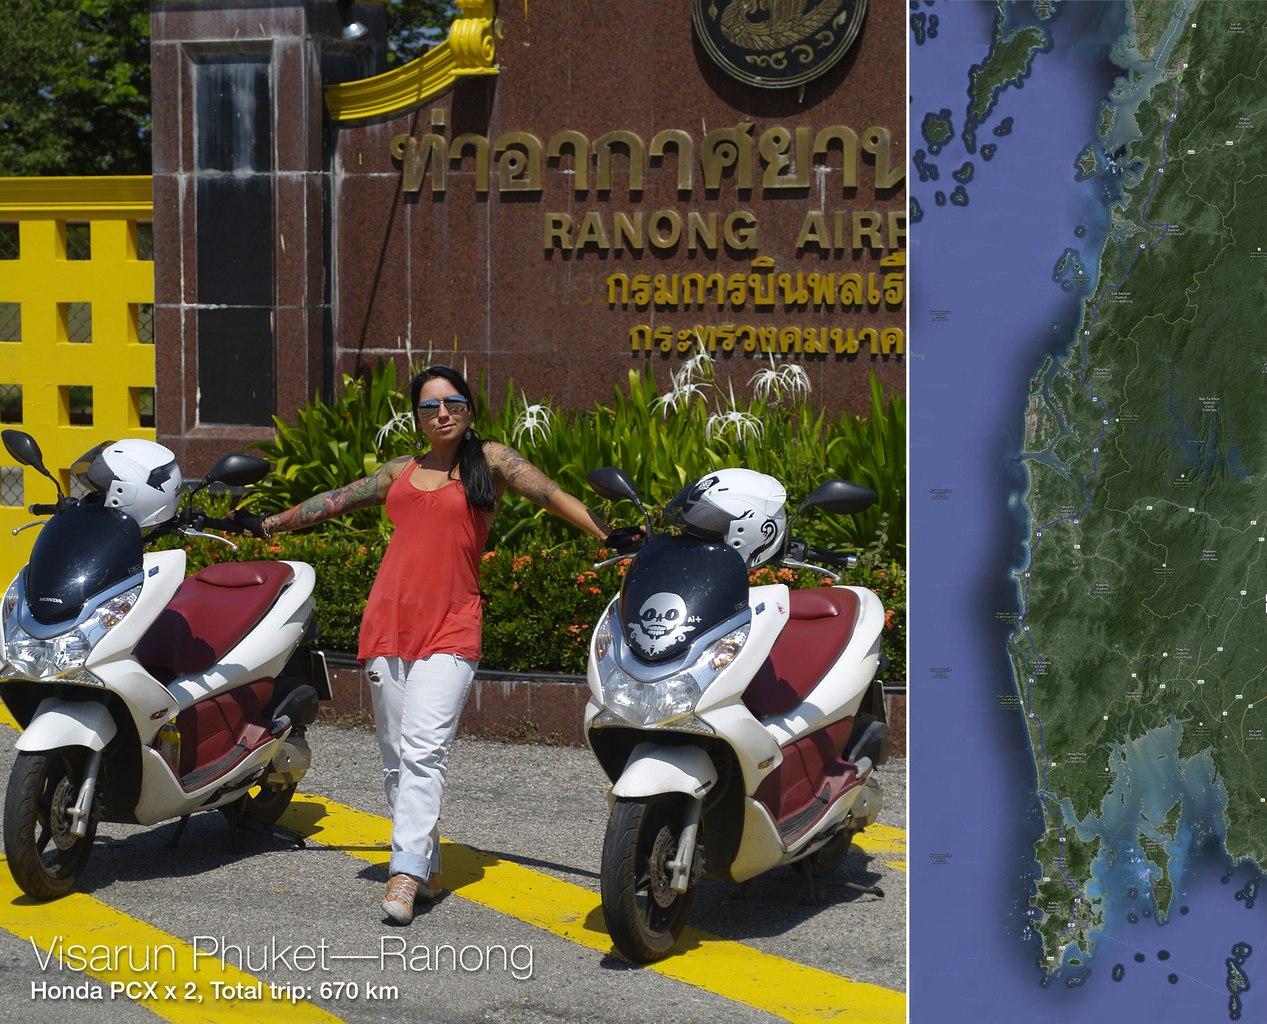 Visarun Phuket Ranong on Honda PCX150